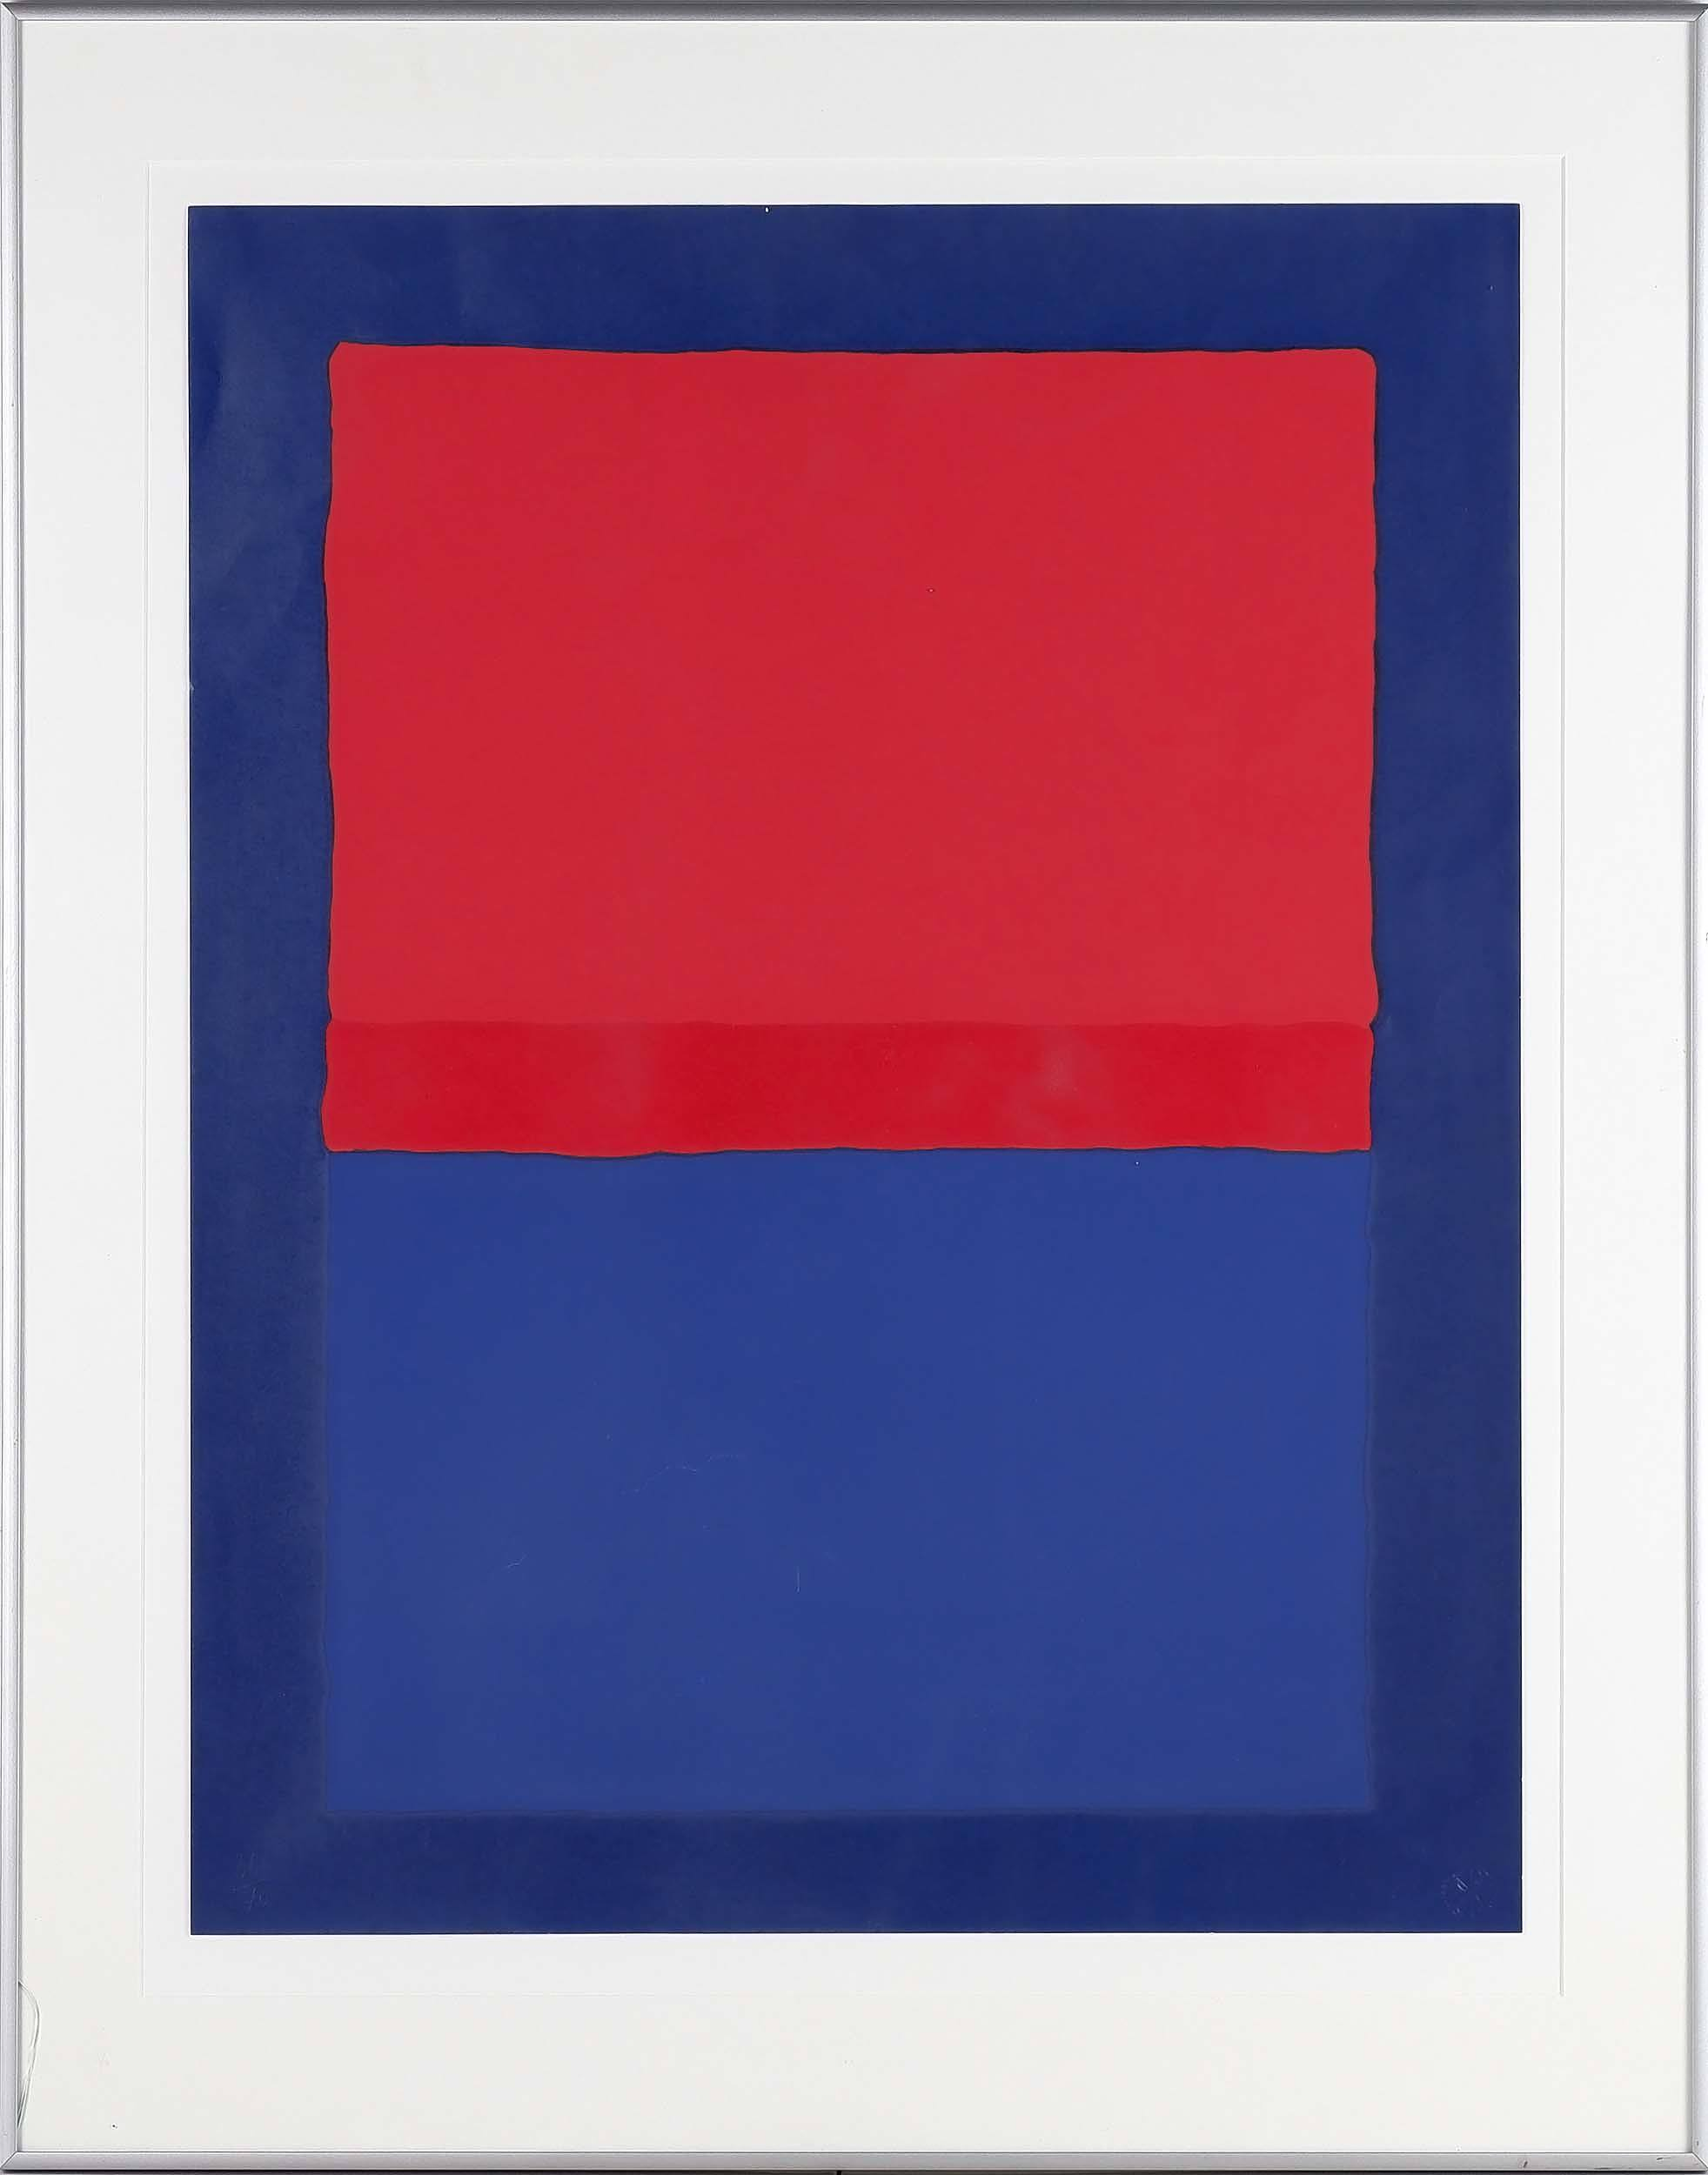 'Roland Weber (1932-1988) Rouge-Bleu Limited Edition Serigraph 36/70'